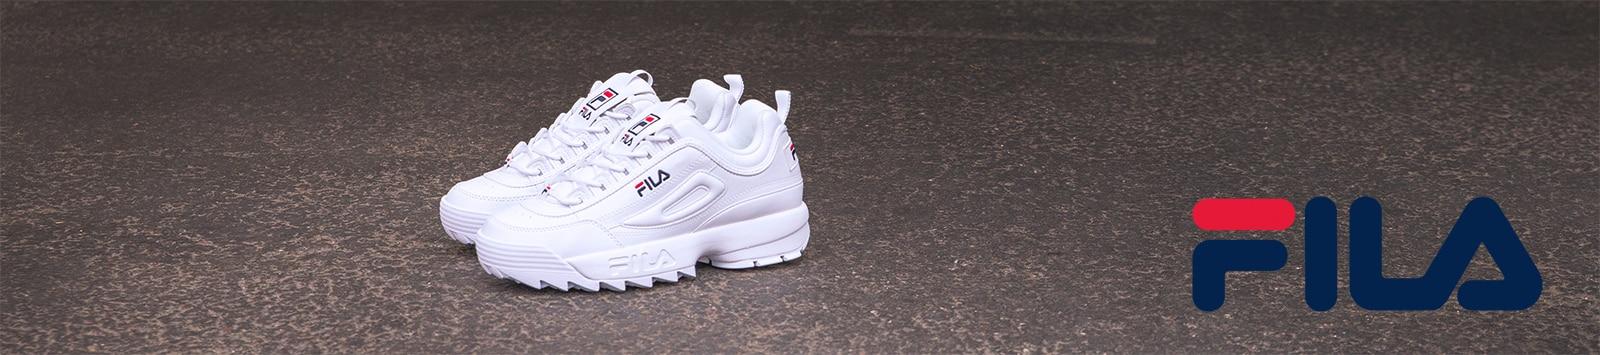 big sale 54aef 2a371 ... promo code nya sneakers från nike 91a84 99988